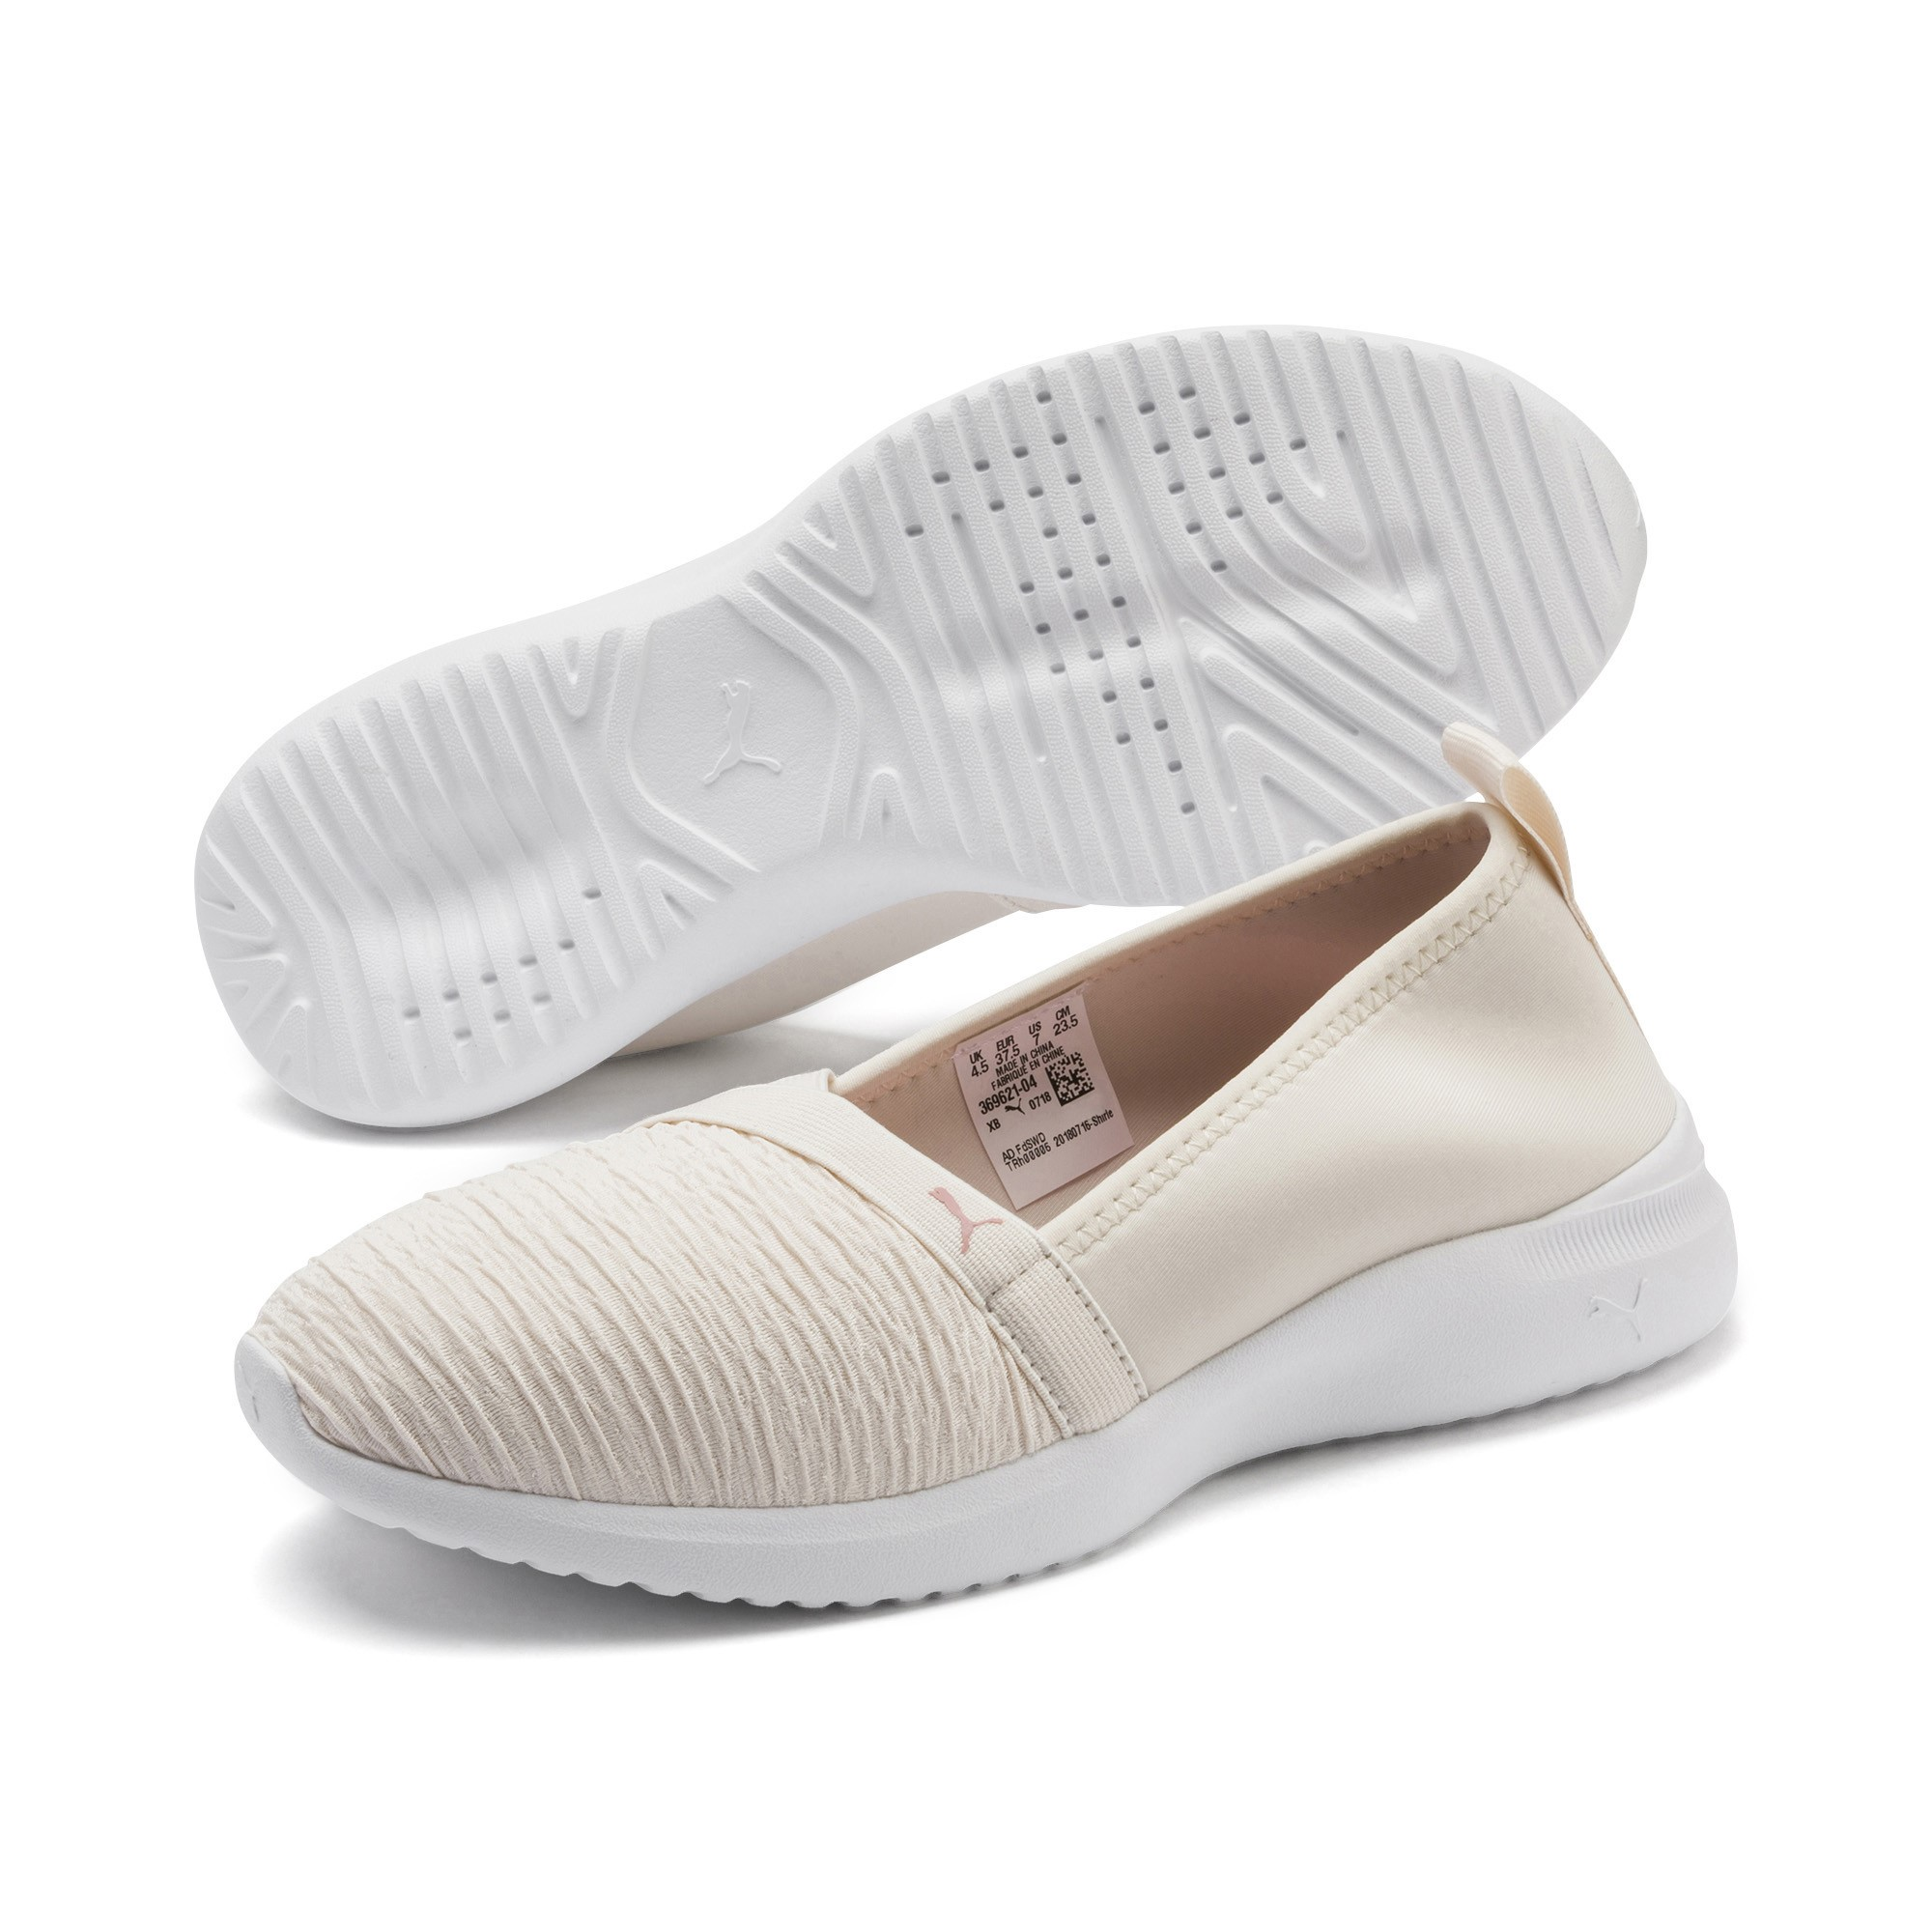 PUMA Adelina Women's Ballet Shoes Women